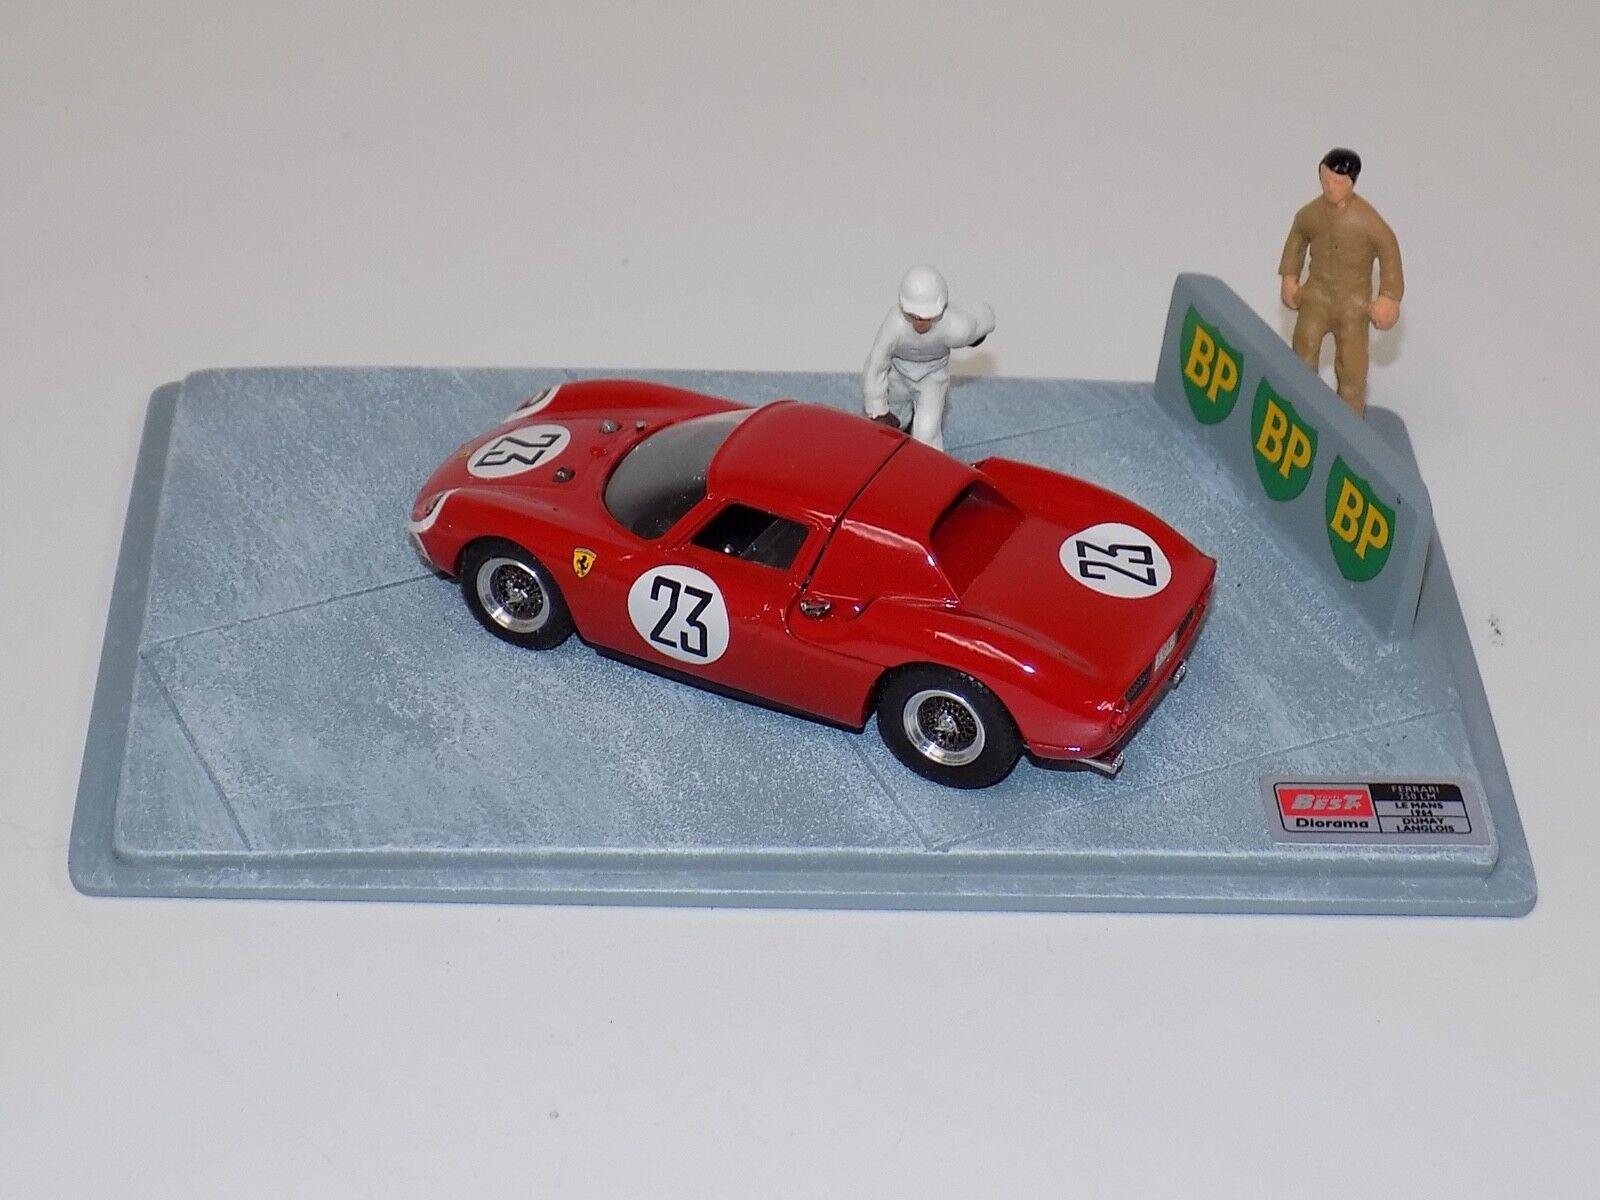 1 43 Best Model Ferrari 250 LM Car  23 from 1964 LeMans Diorama   9604